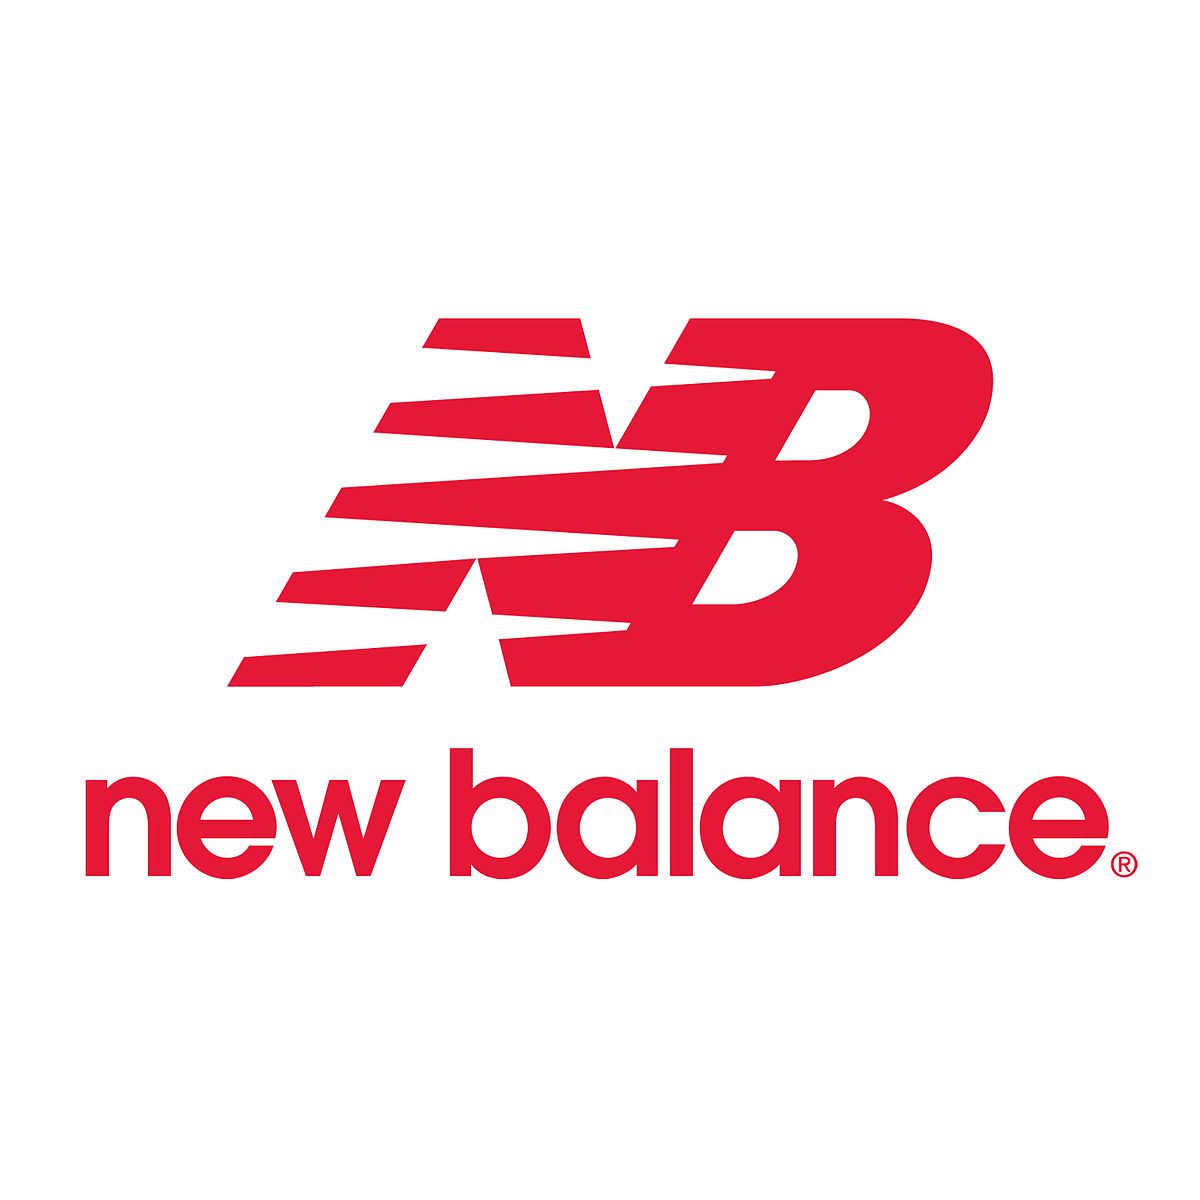 9de128a04a8 New Balance - Wikipedia